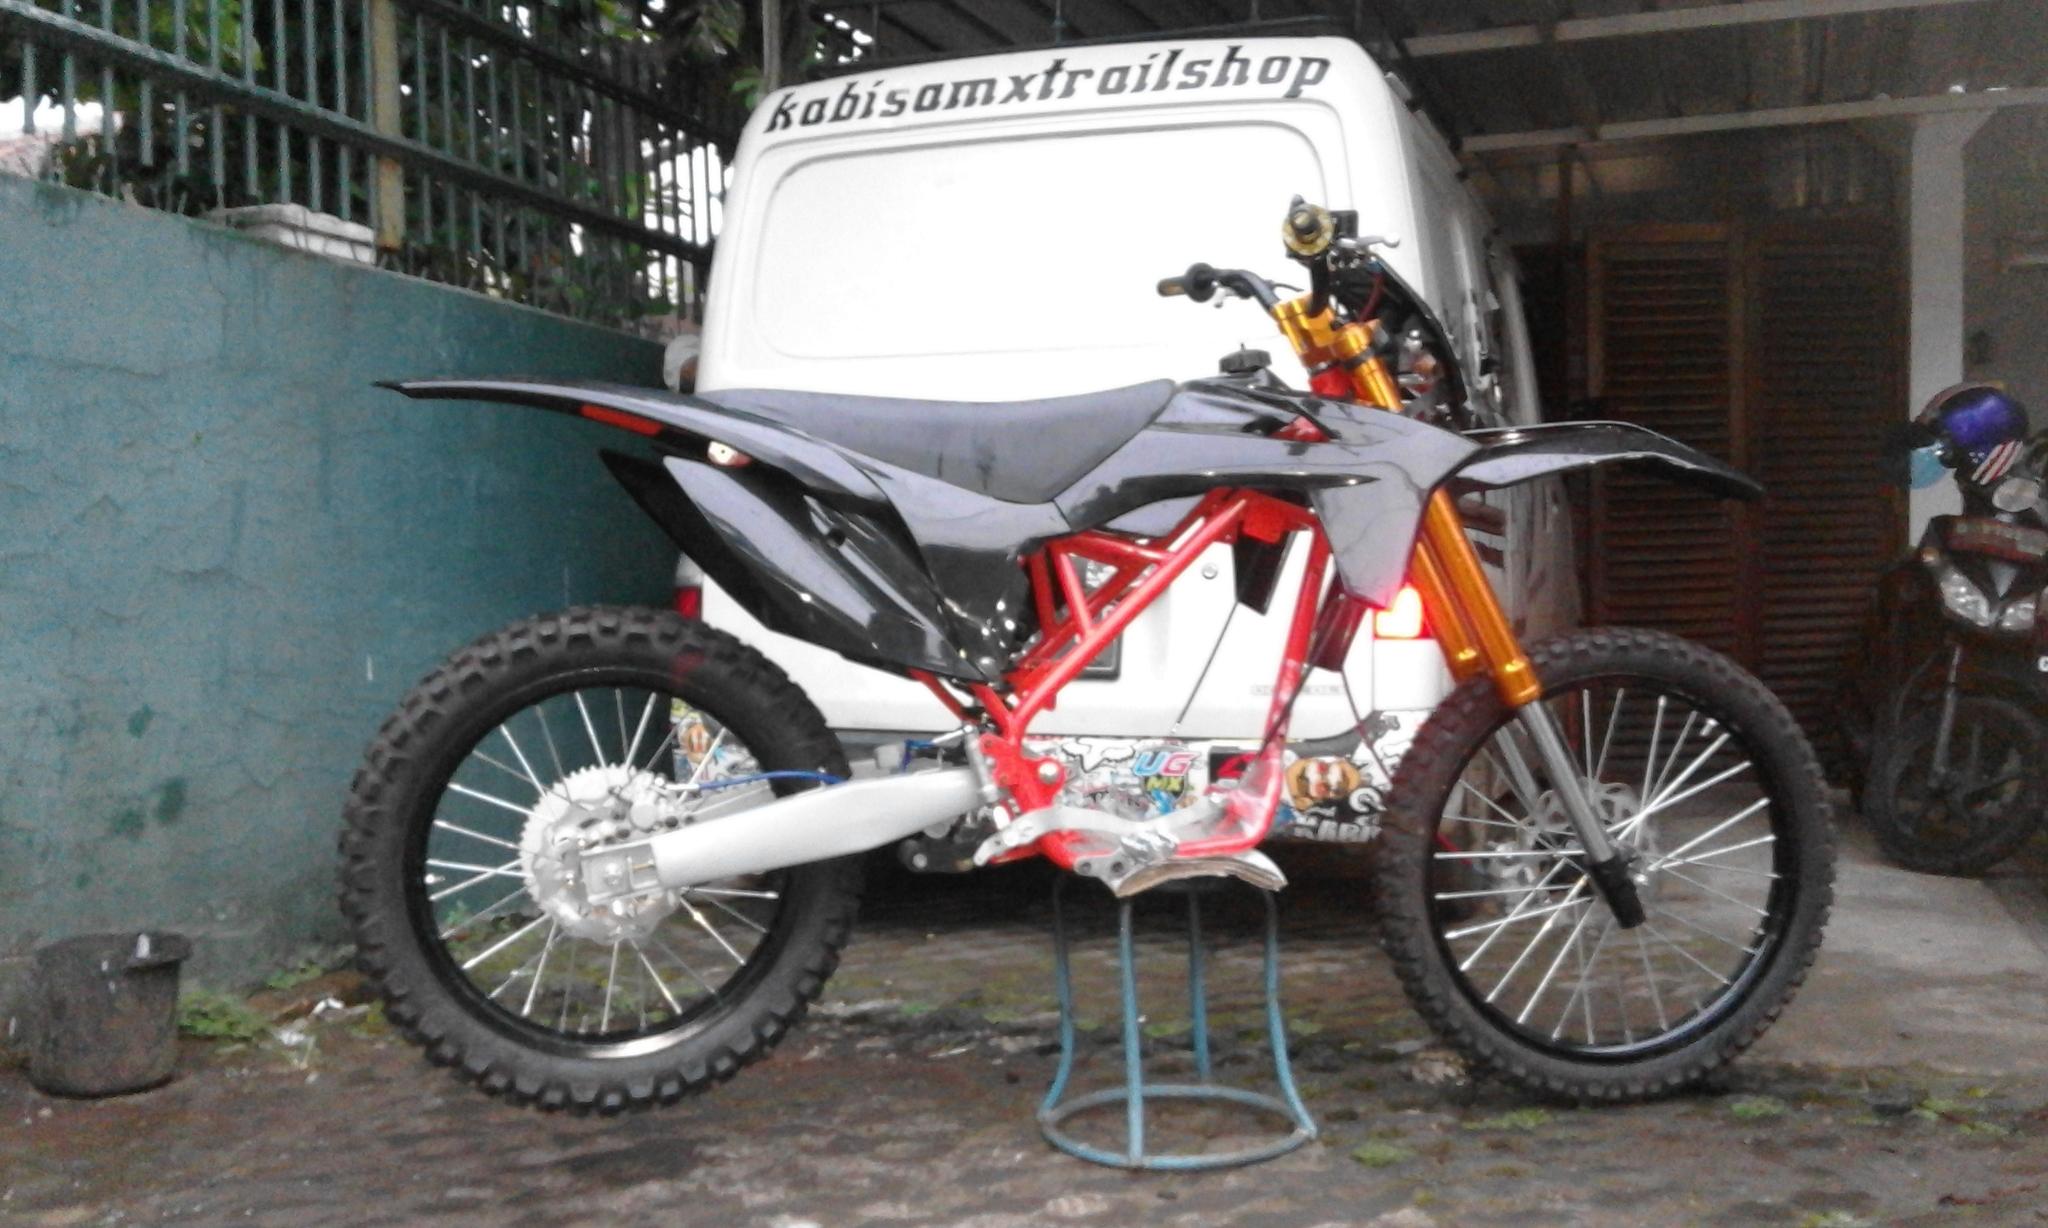 Jual Paket Modif Trail Murah Meriah Klx Body Ktm Tanp Mesin Kaki2